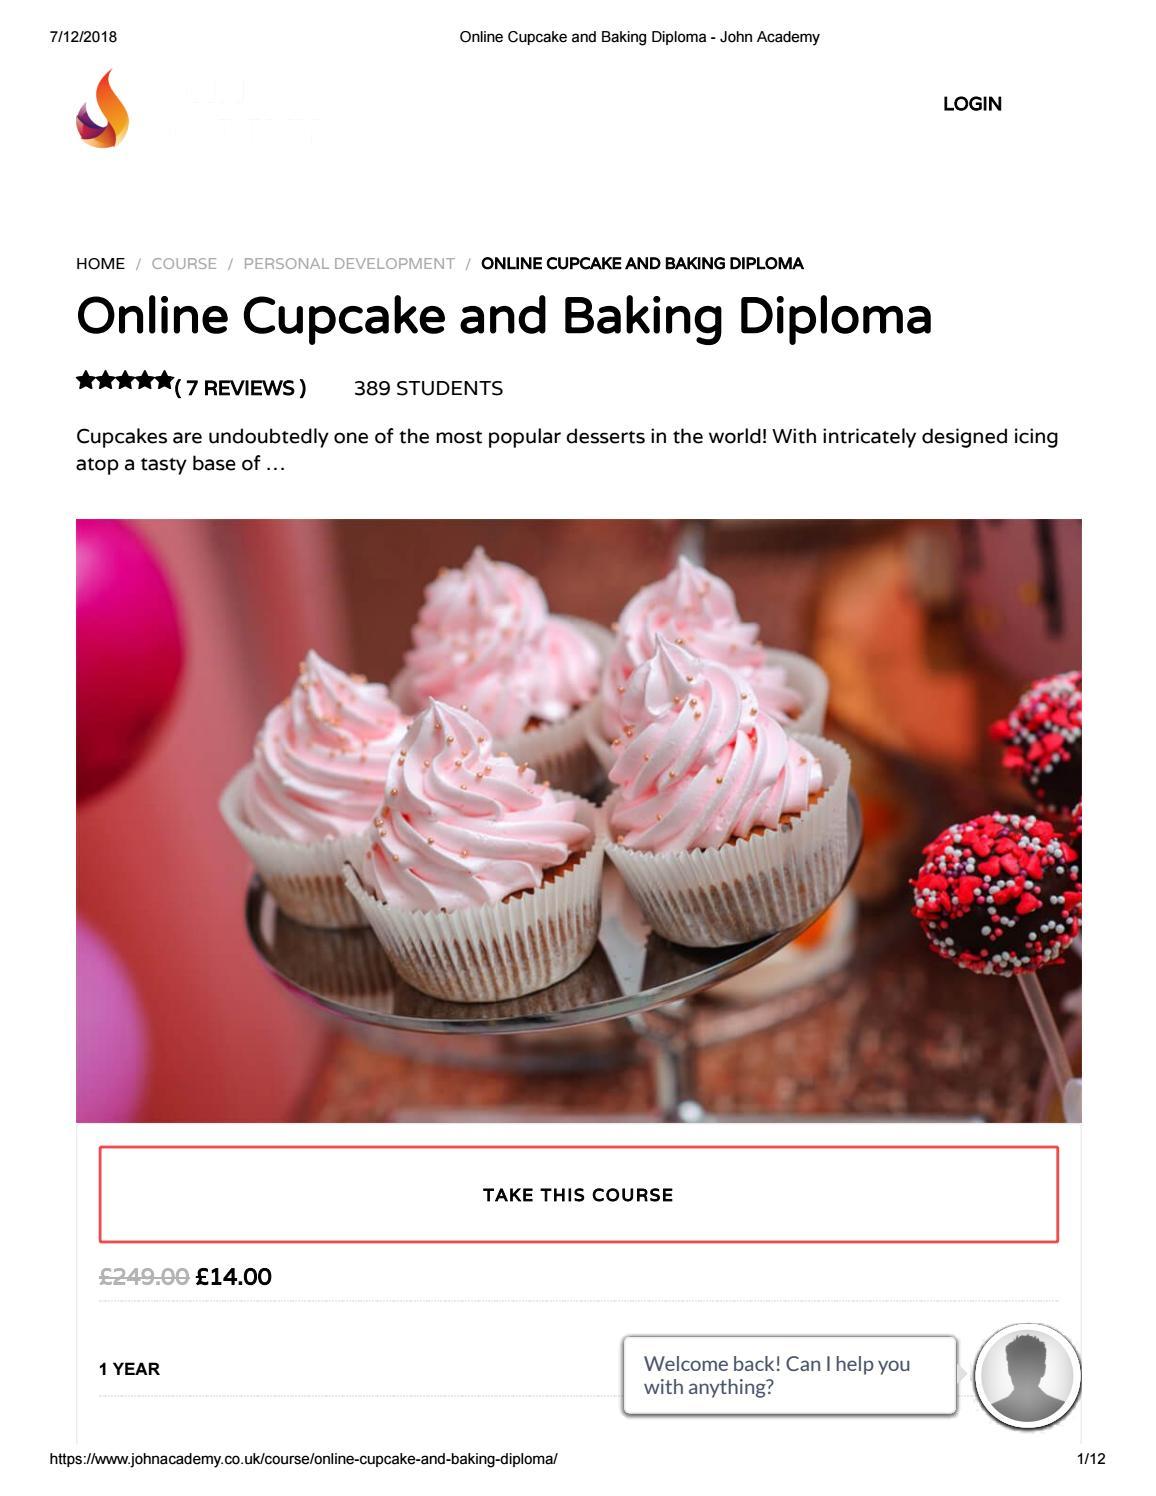 Online Cupcake and Baking Diploma - John Academy by John